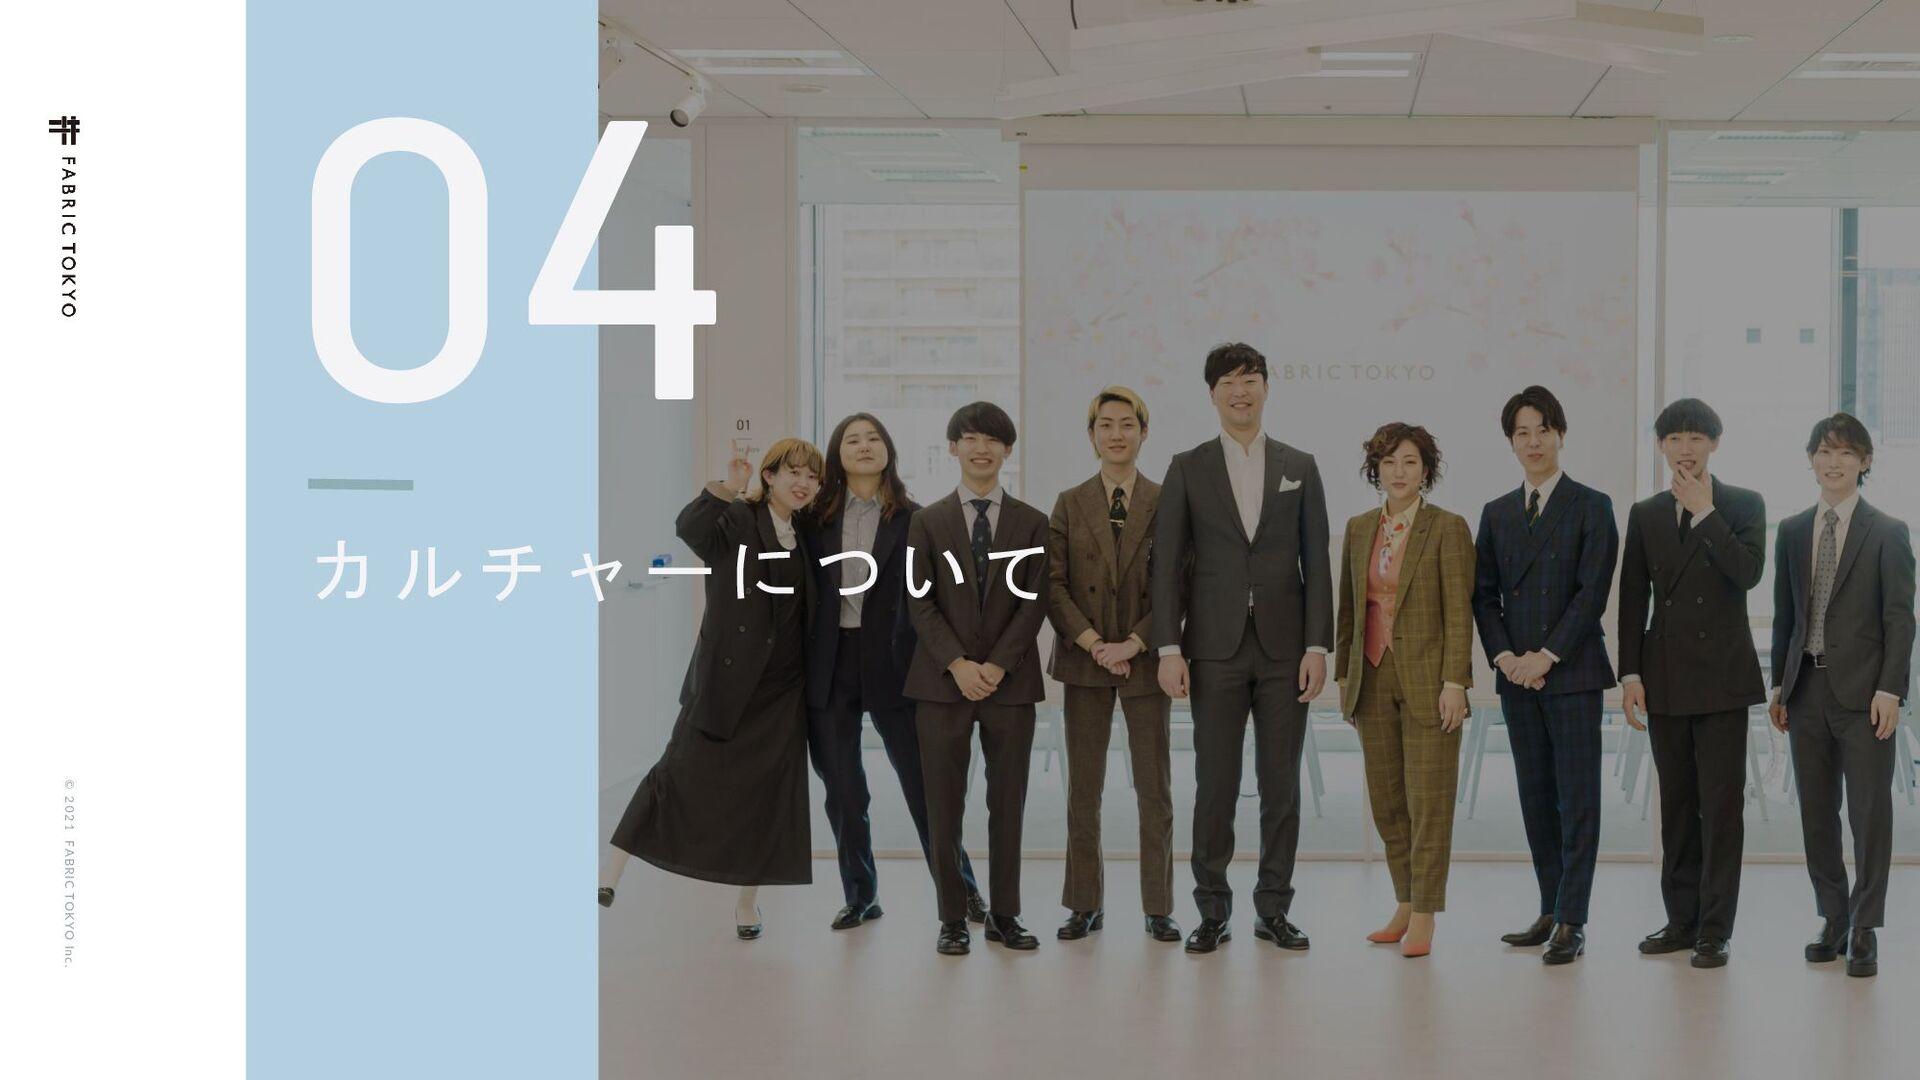 © 2021 FABRIC TOKYO Inc. 41 Χϧνϟʔʹ͍ͭͯʢ53:ʣ ϫʔΩϯ...